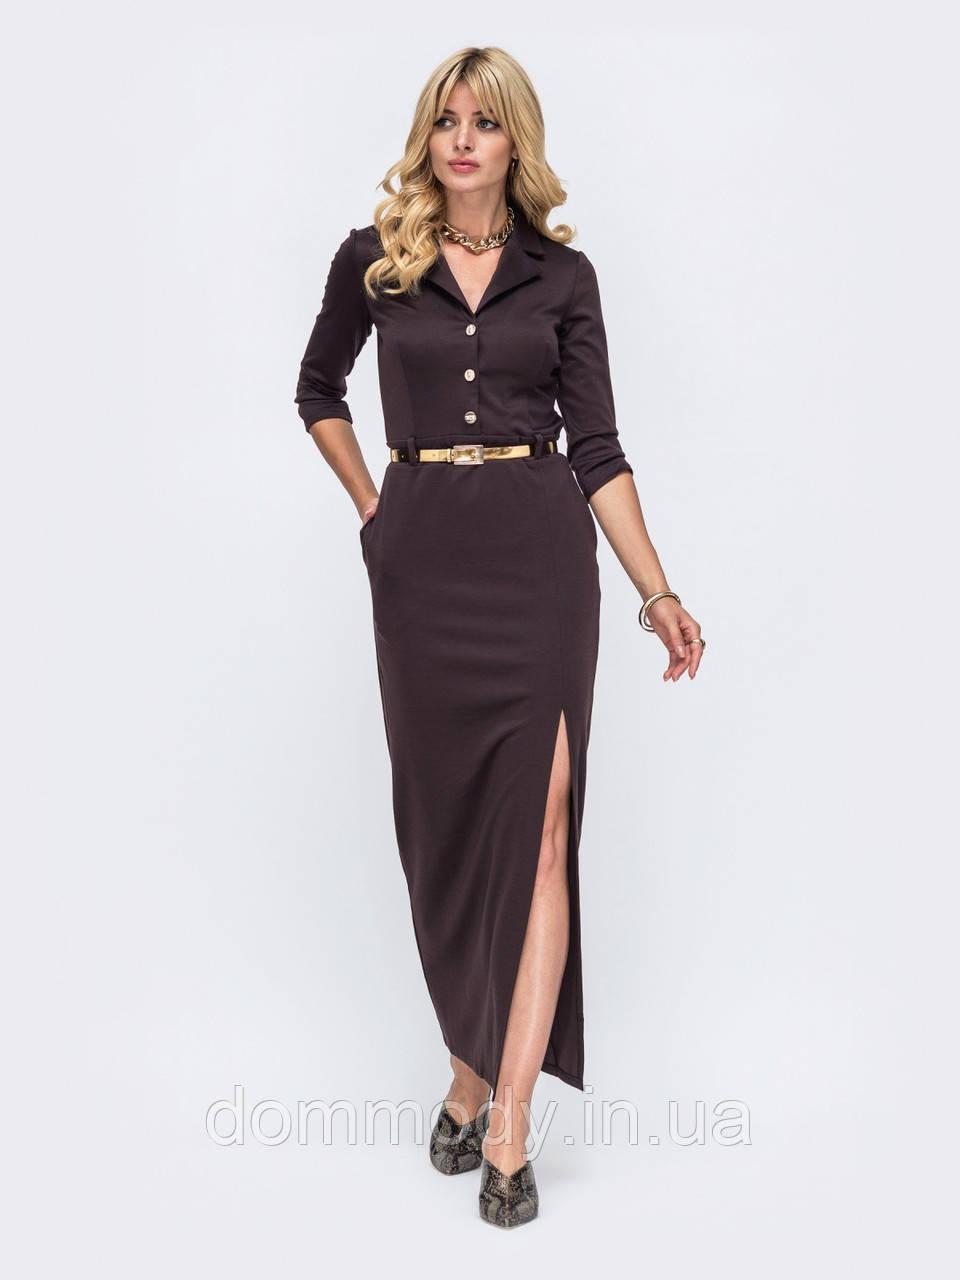 Платье женское Gloria brown